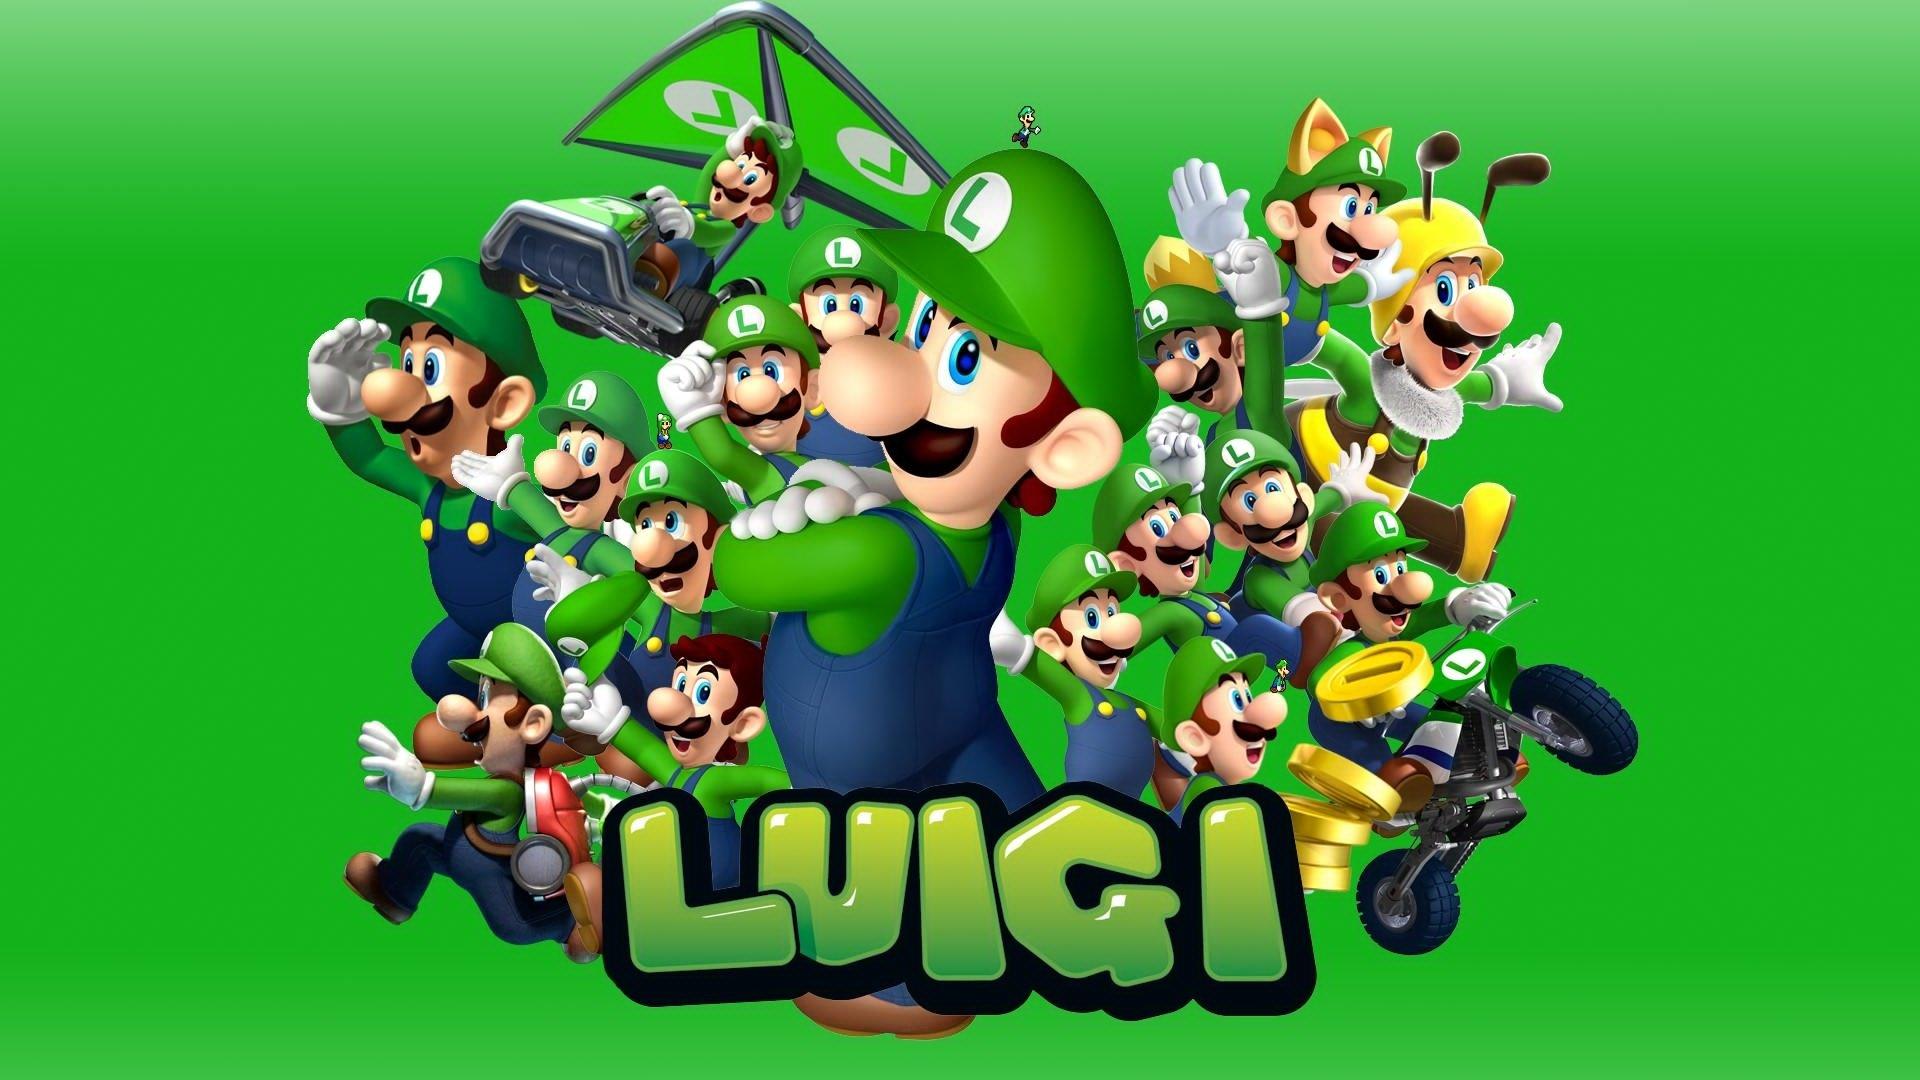 Luigi Hd Wallpaper Hintergrund 1920x1080 Id 825164 Wallpaper